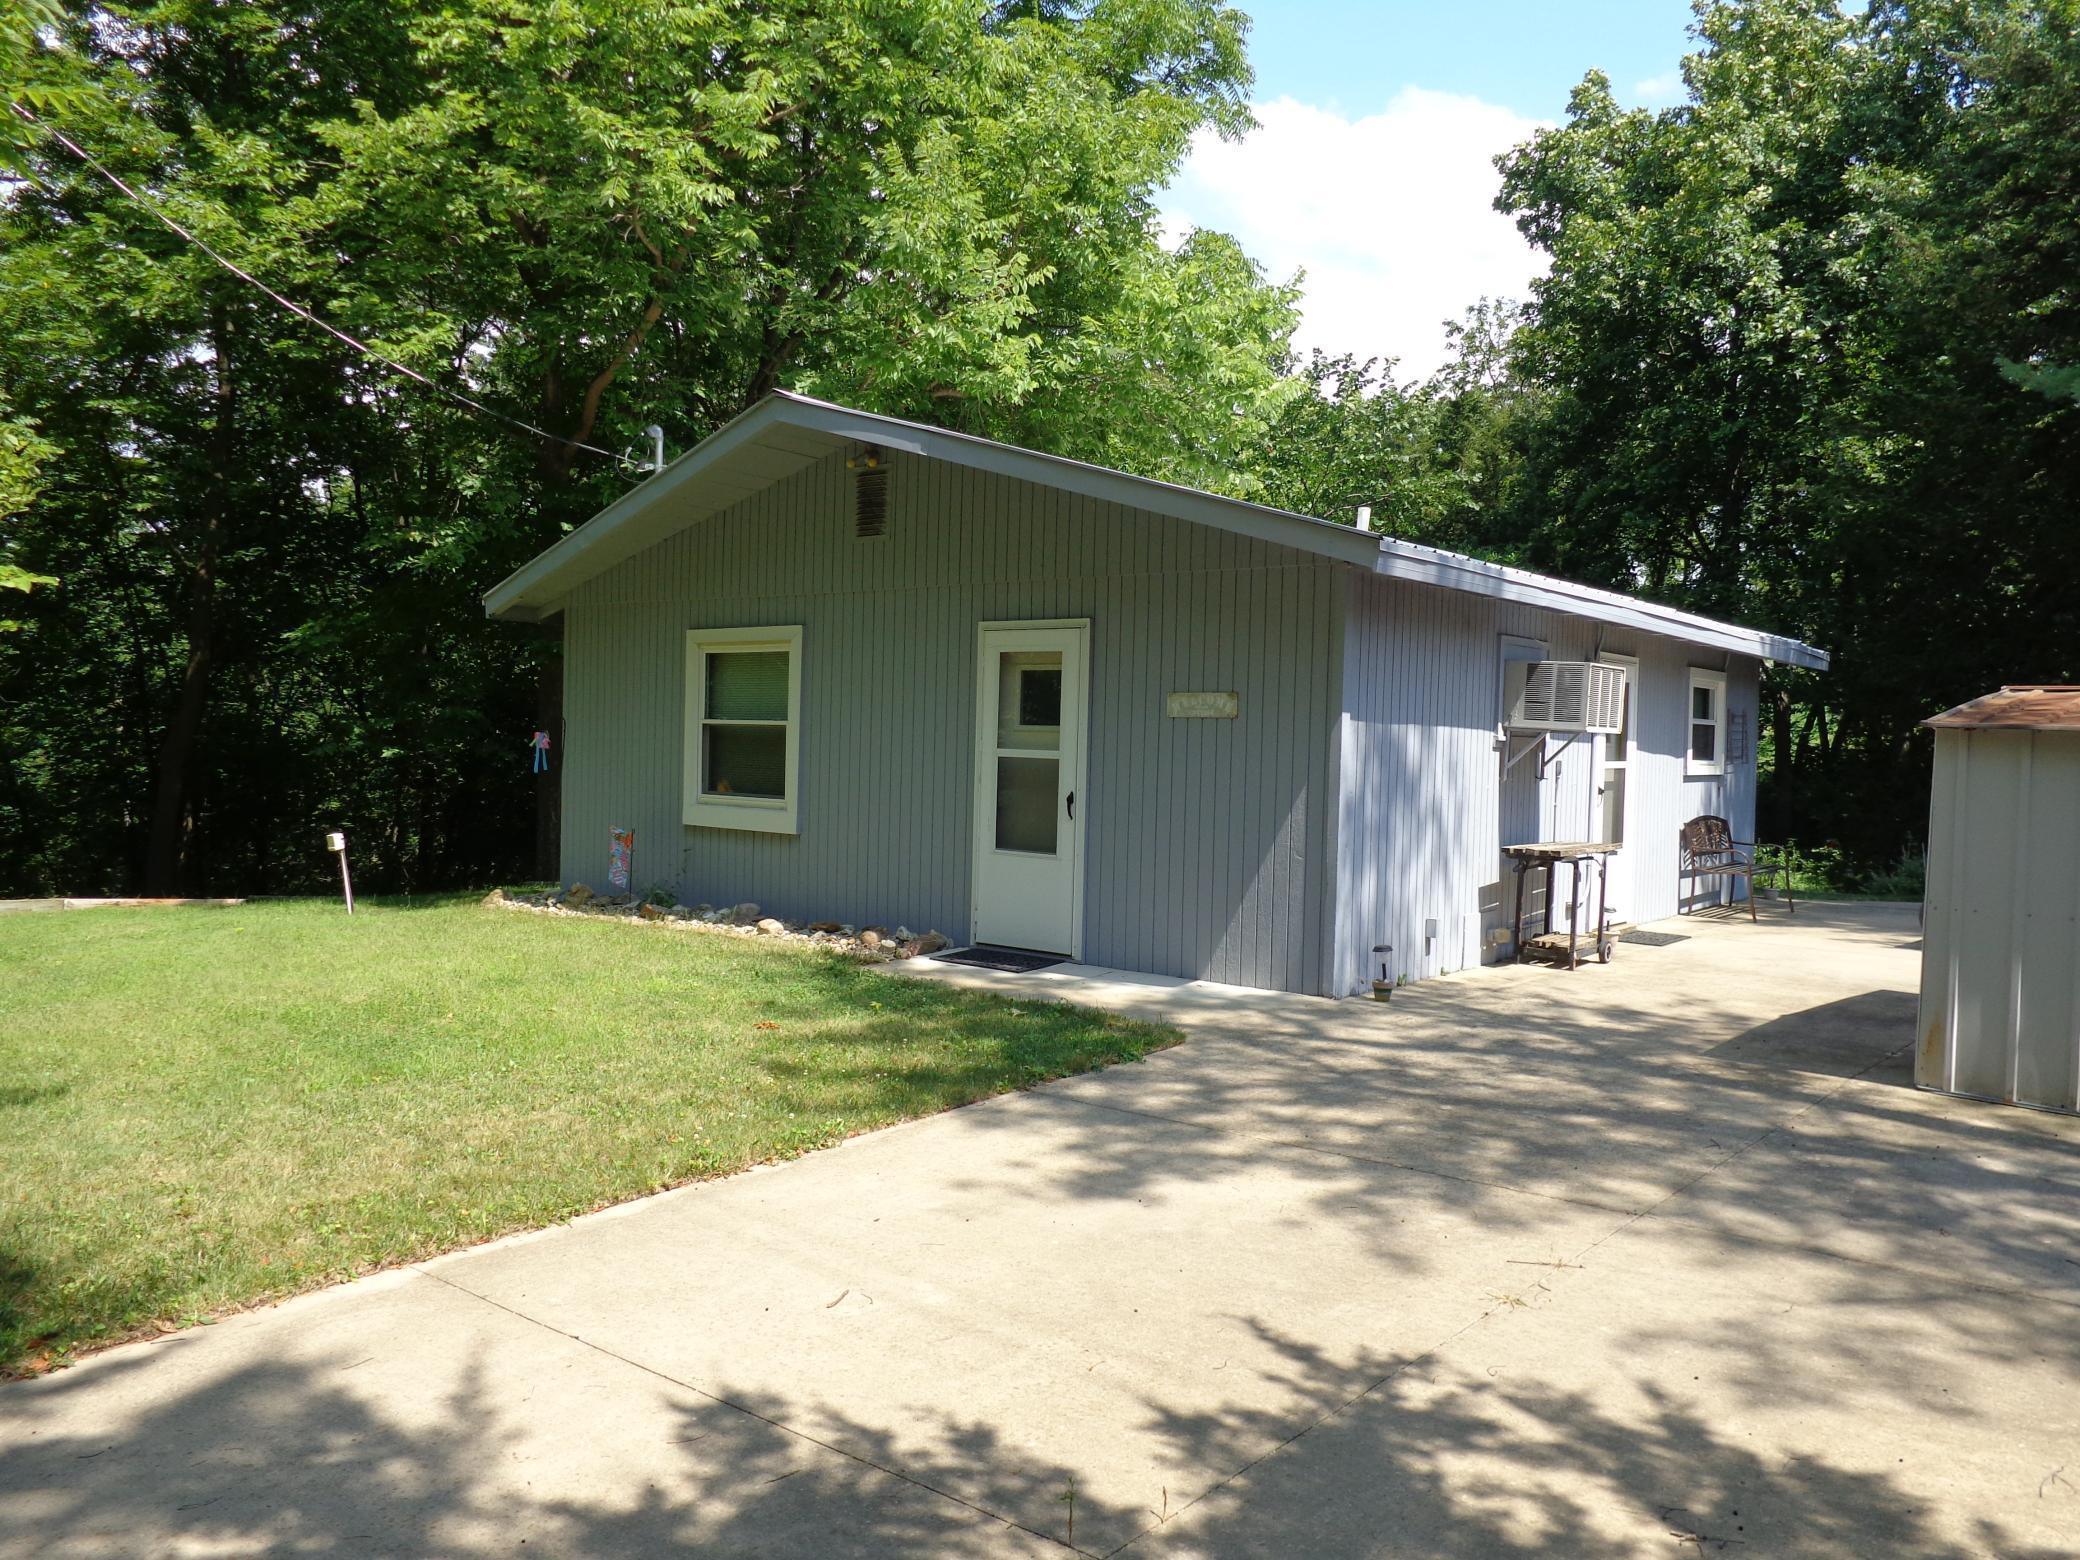 1230 Park, Brooklyn, Iowa 52211-3035, 2 Bedrooms Bedrooms, ,1 BathroomBathrooms,Single Family,For Sale,Park,5638187